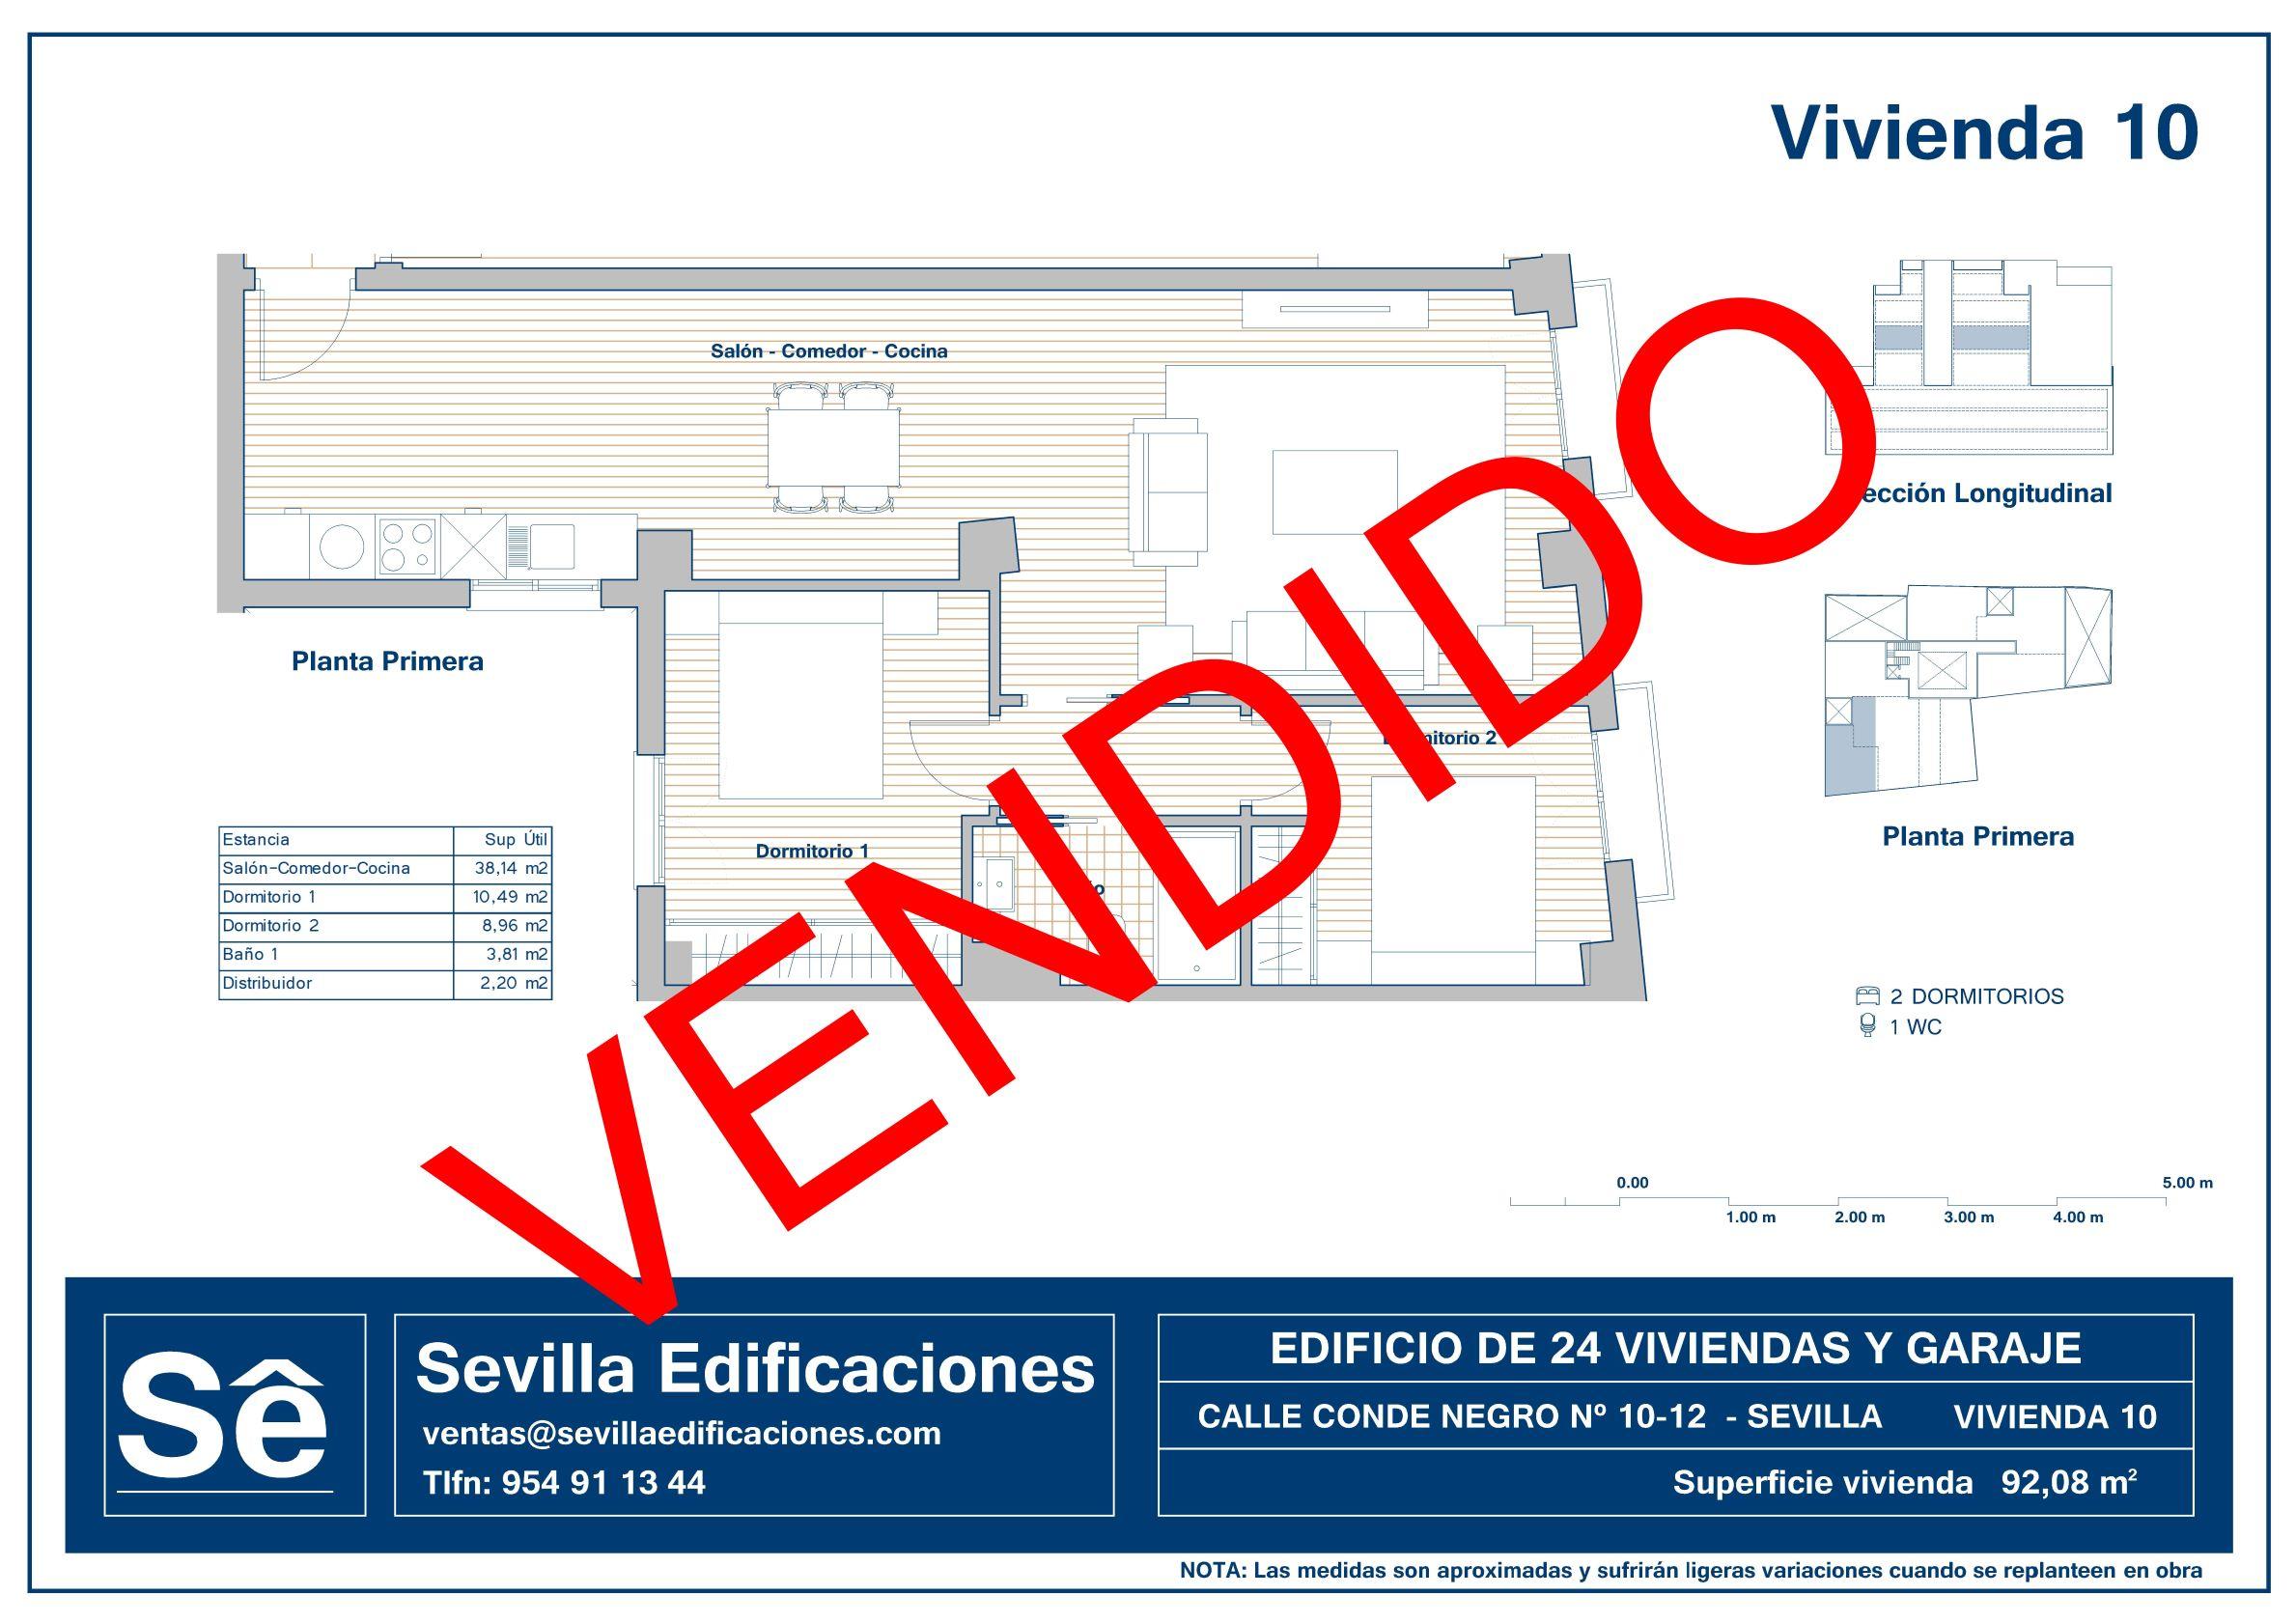 CONDENEGRO_VIVIENDA_10_VENDIDO